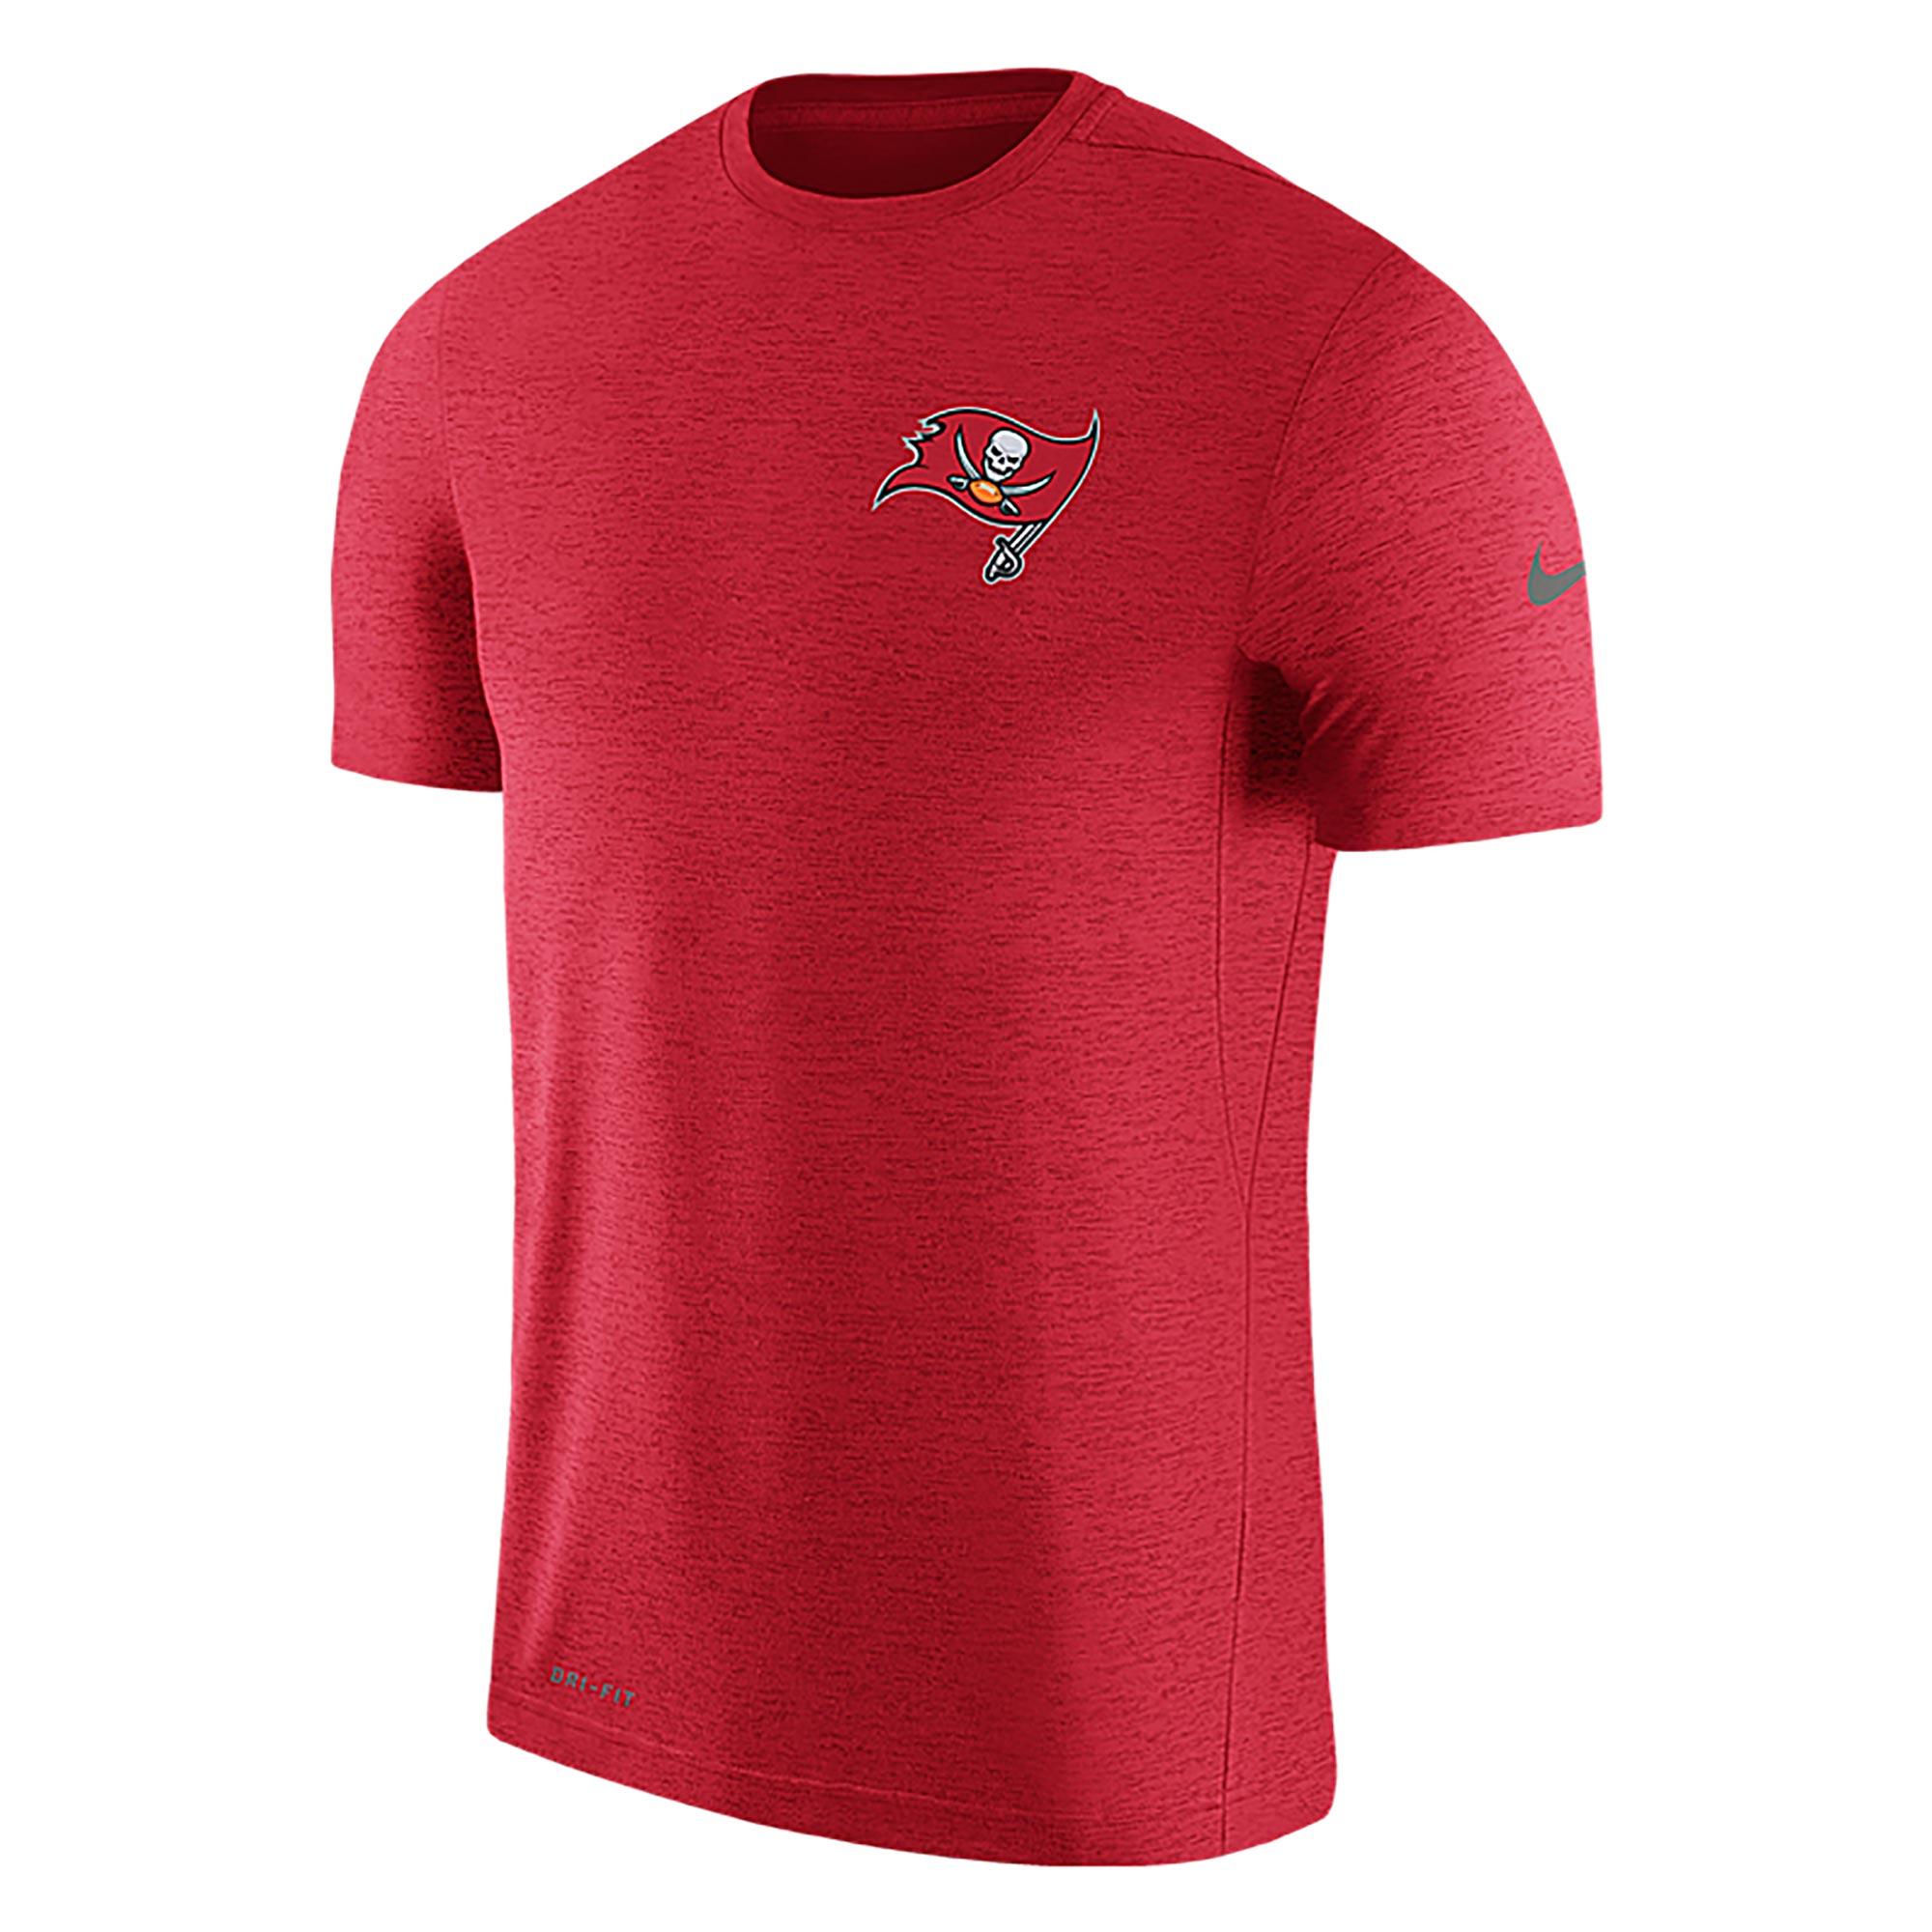 Tampa Bay Buccaneers Coach T-Shirt